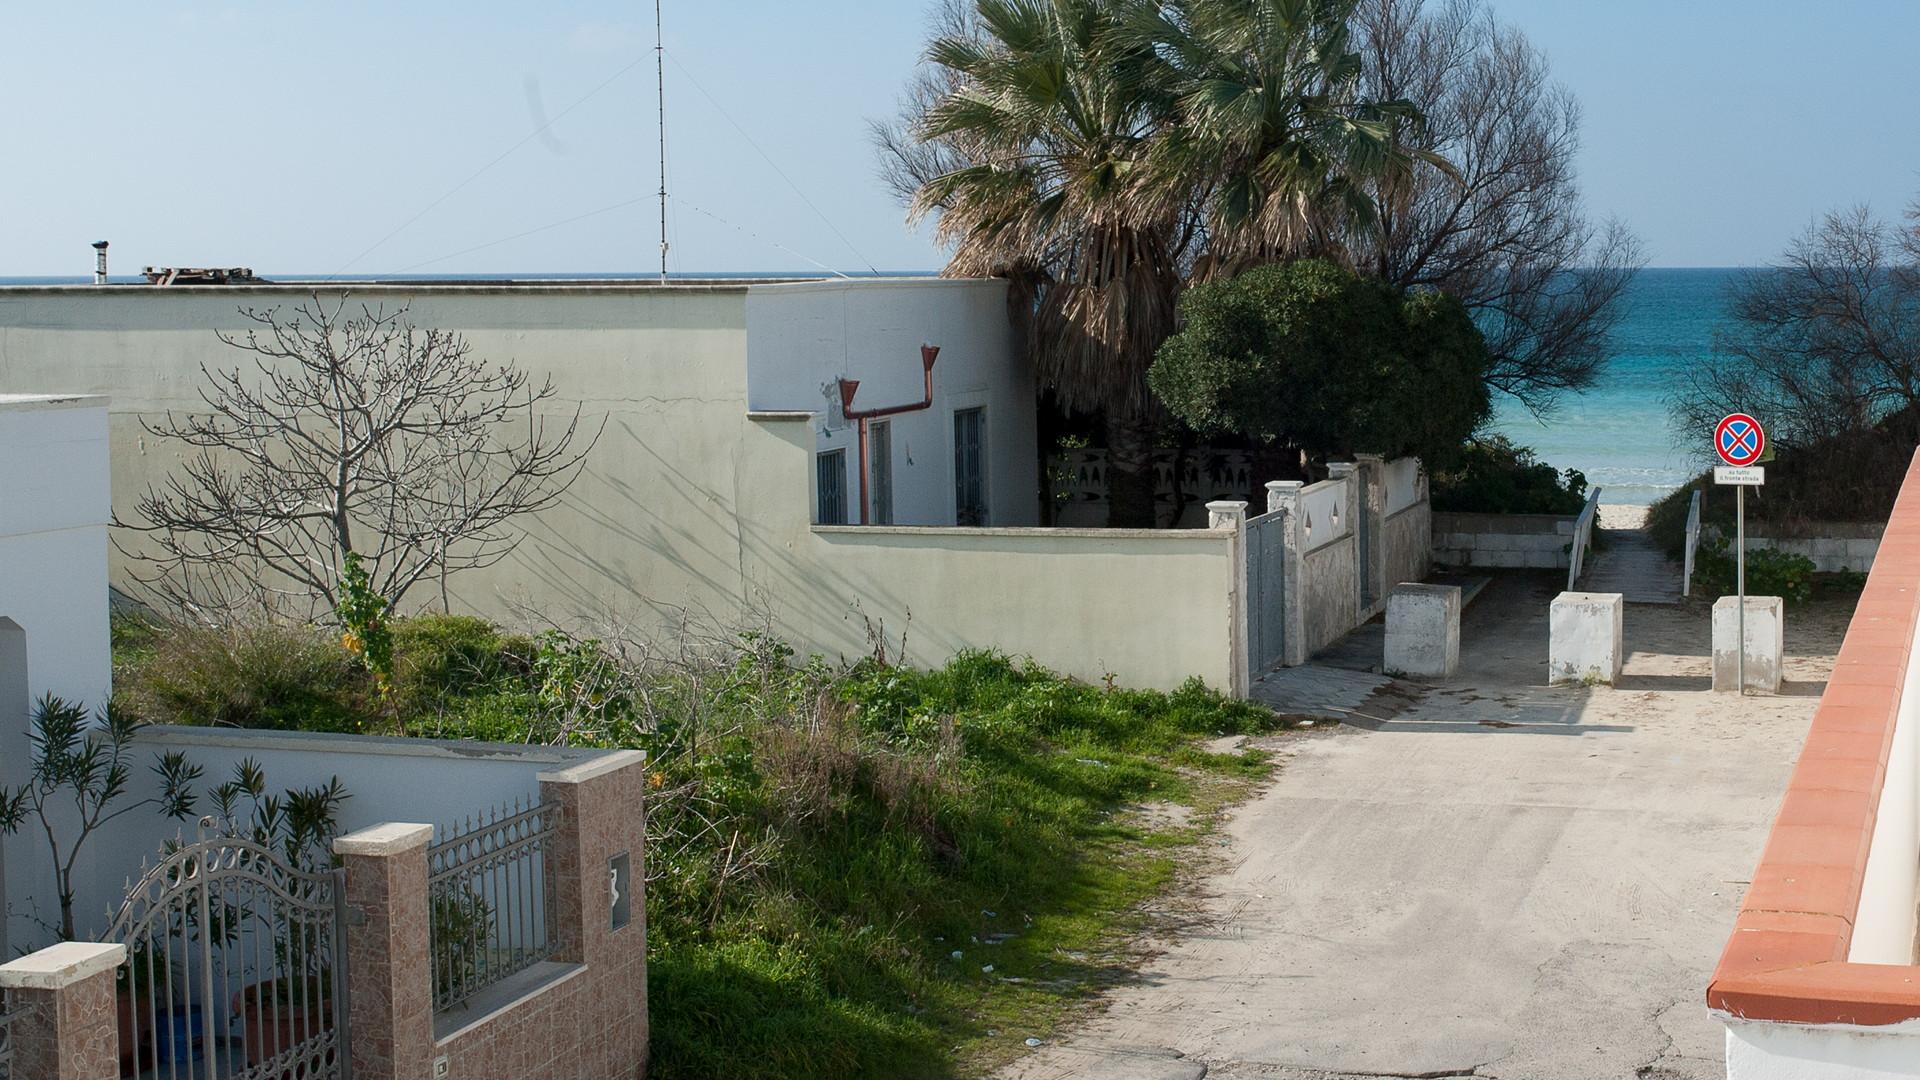 Ferienhaus Villa Due Mari-20 meters from the beach (2354062), Porto Cesareo, Lecce, Apulien, Italien, Bild 26